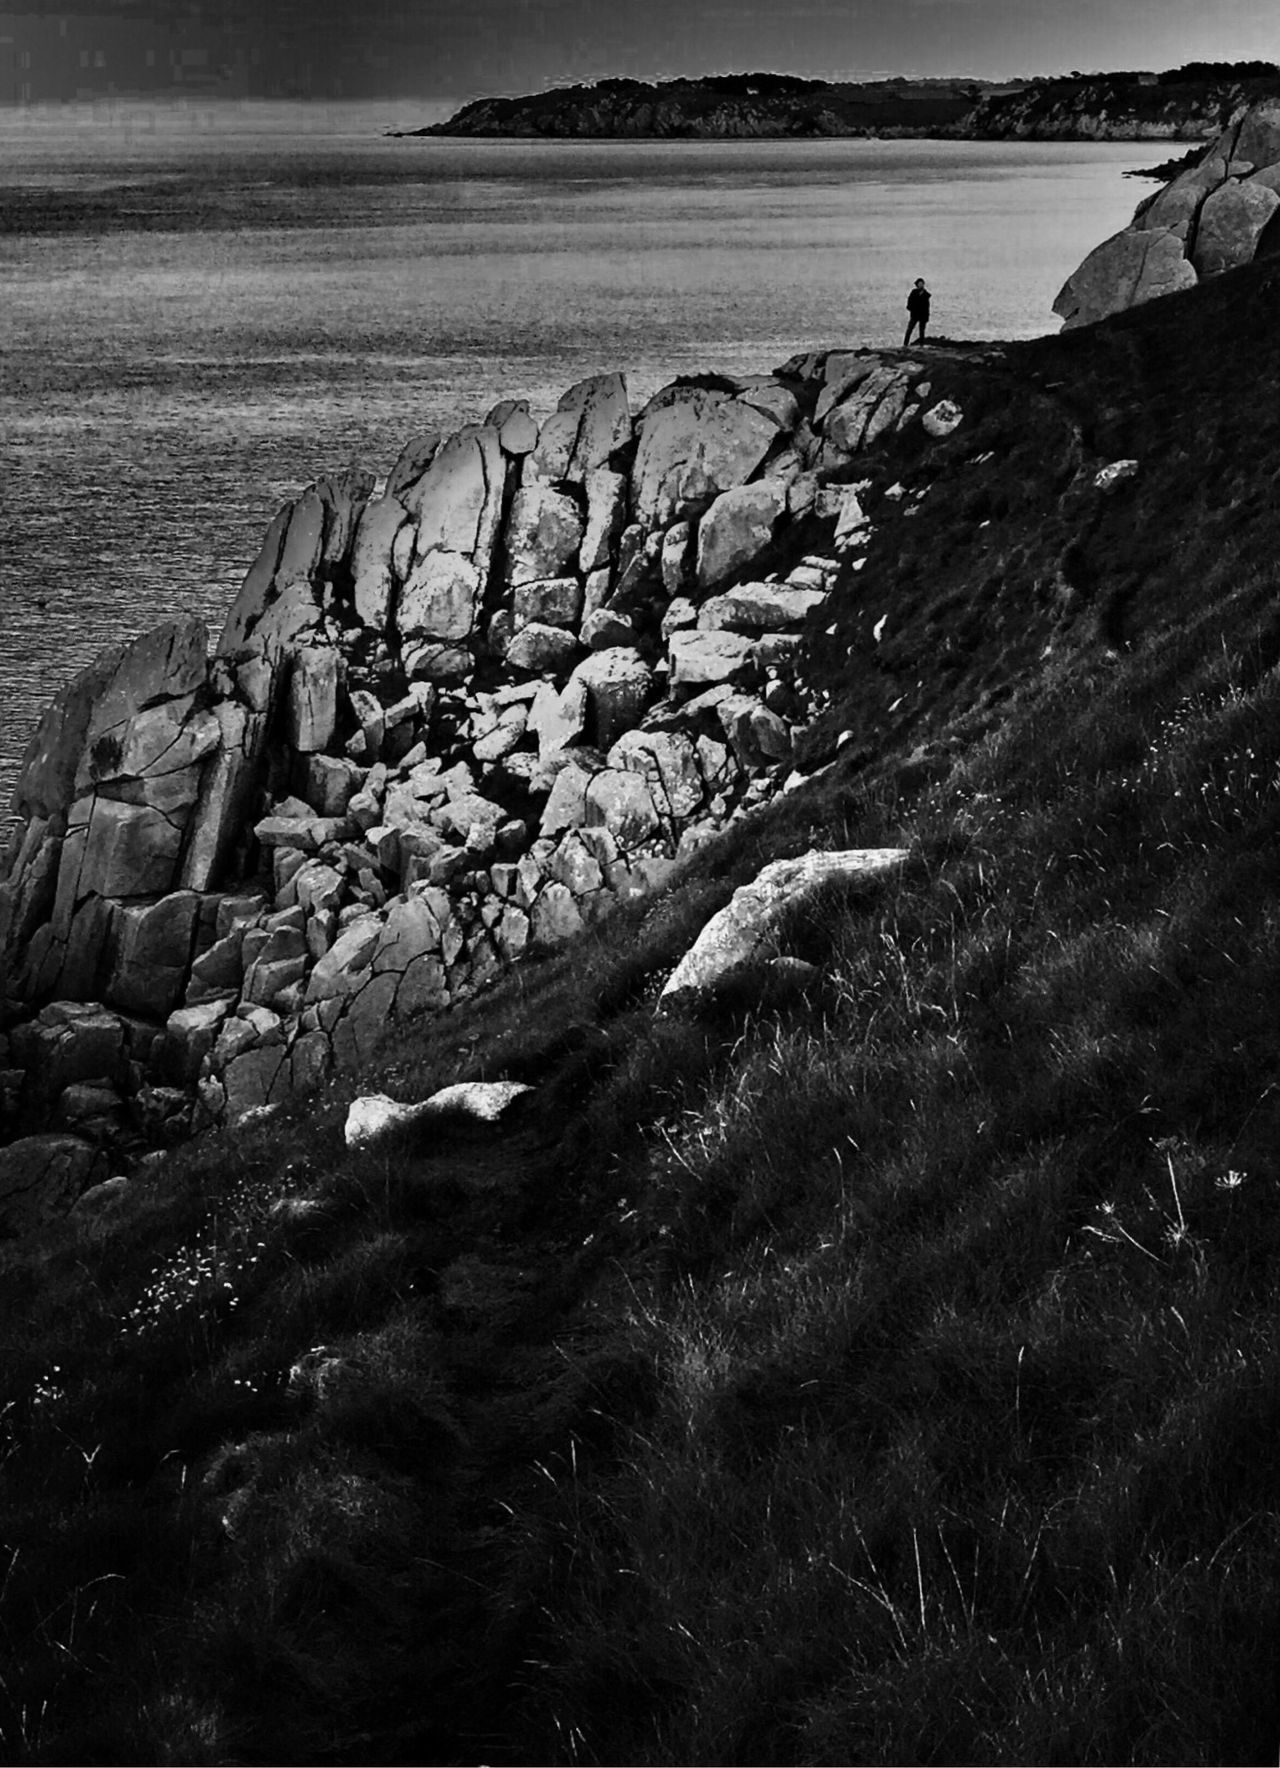 Ocean View Alone Blackandwhite Seascape Cliffs Rocks